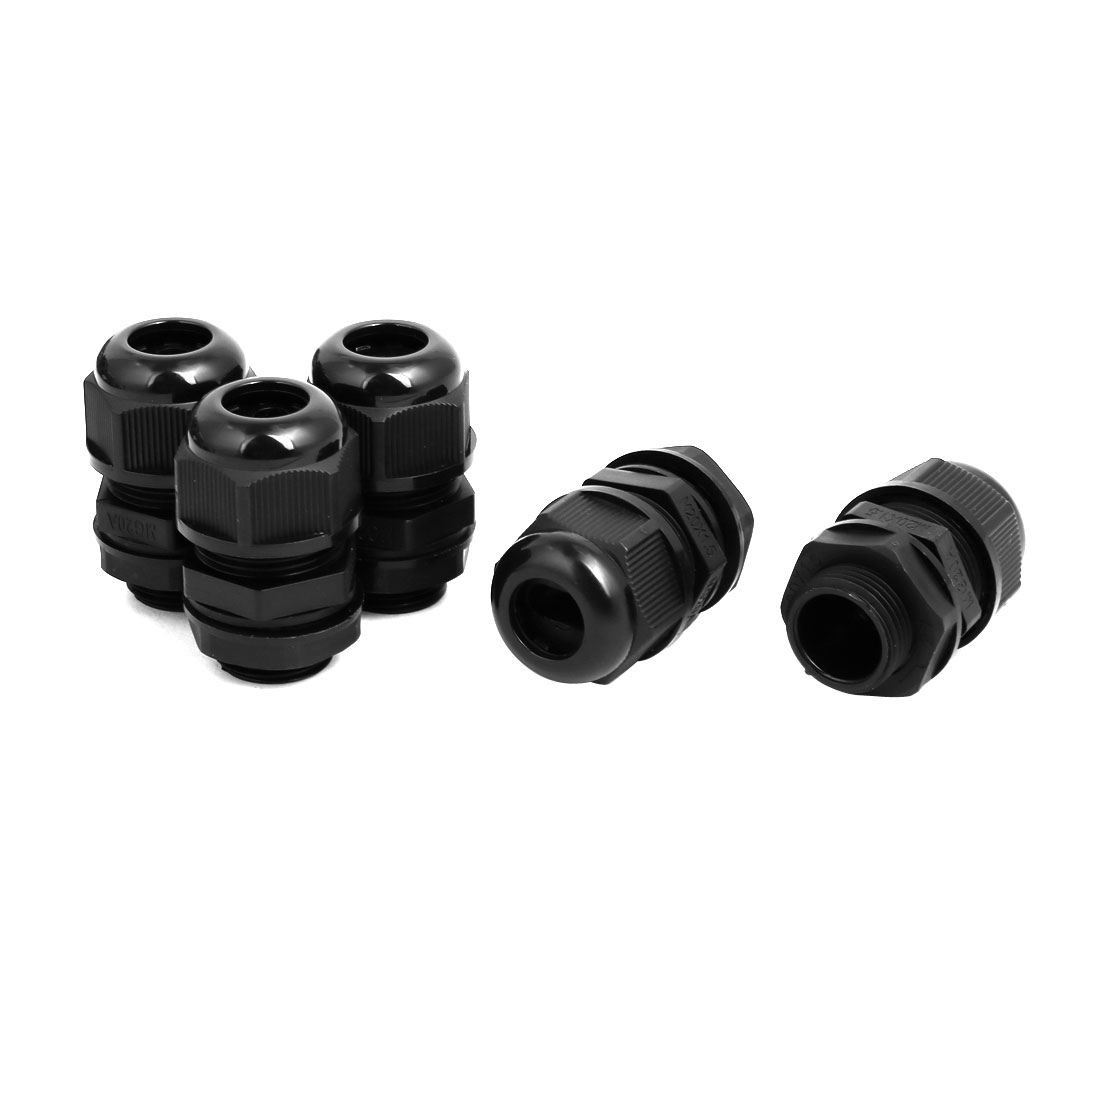 M20x1.5mm Single Hole Adjustable Cables Gland Black 5pcs